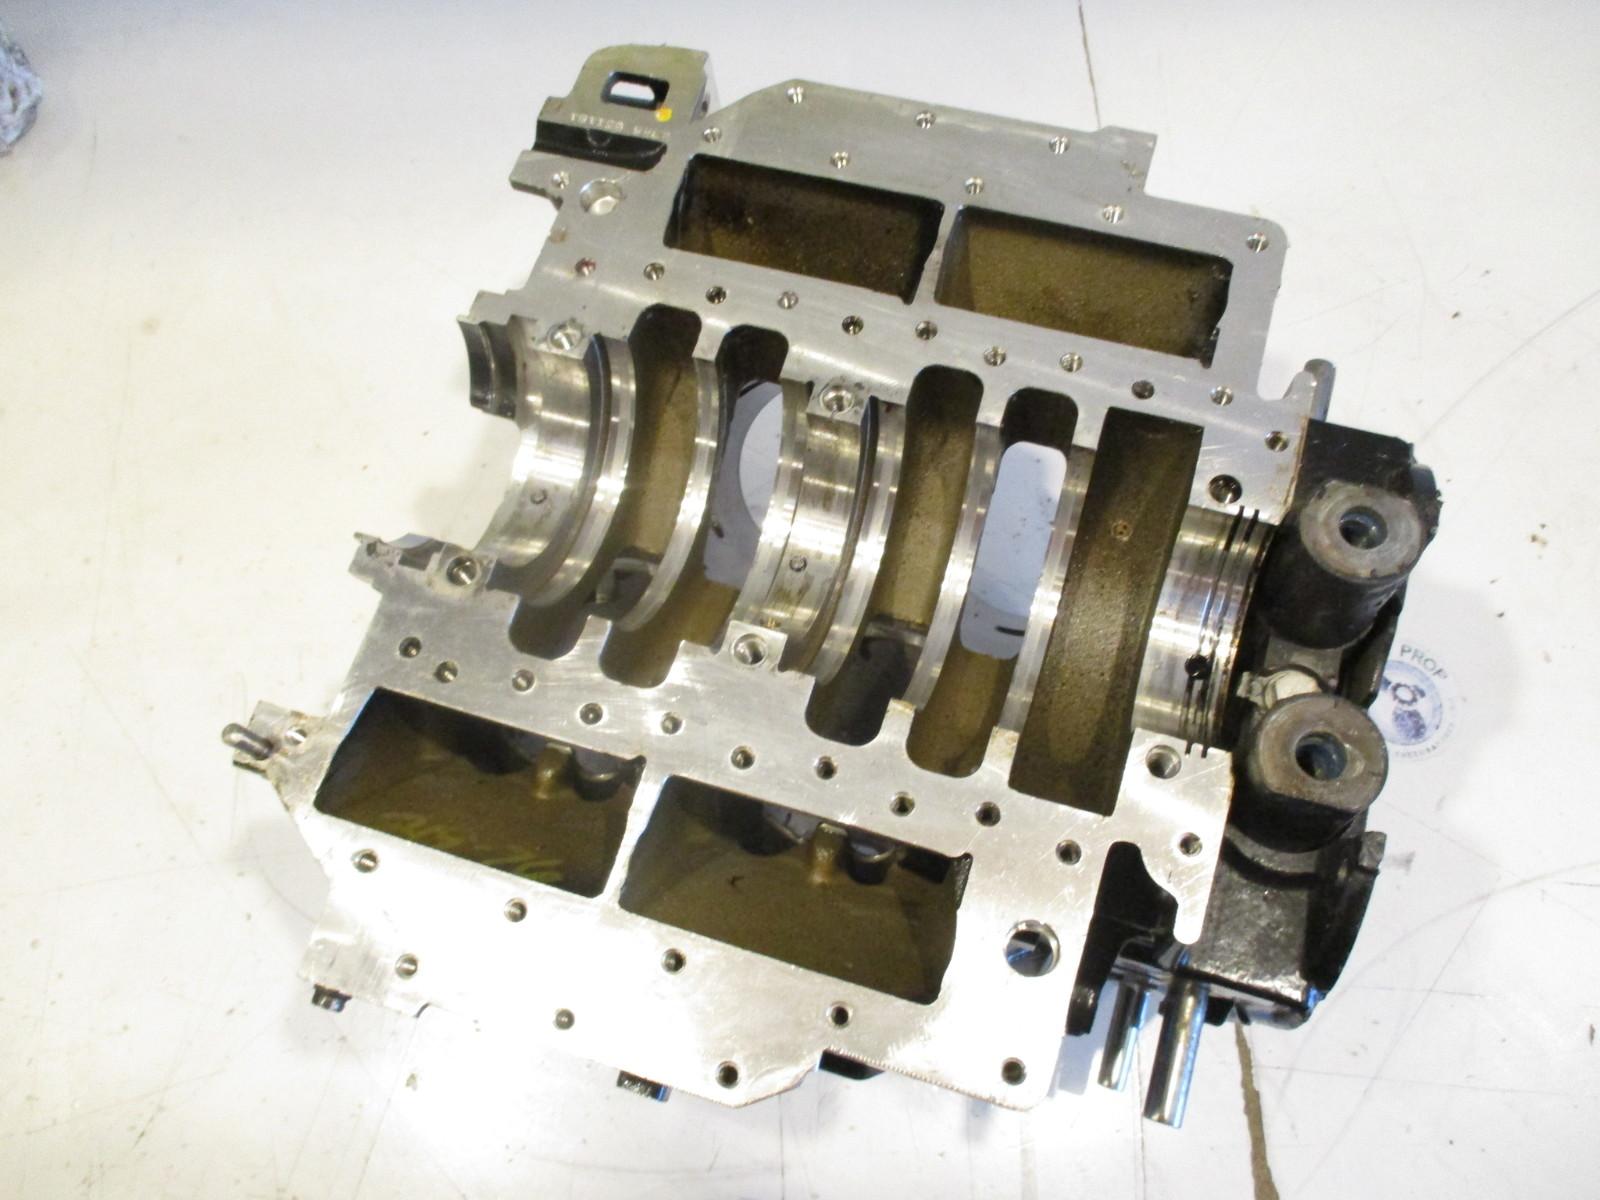 5004929 Evinrude Johnson Outboard Cylinder Block & Crankcase 75-115 HP  2001-2006